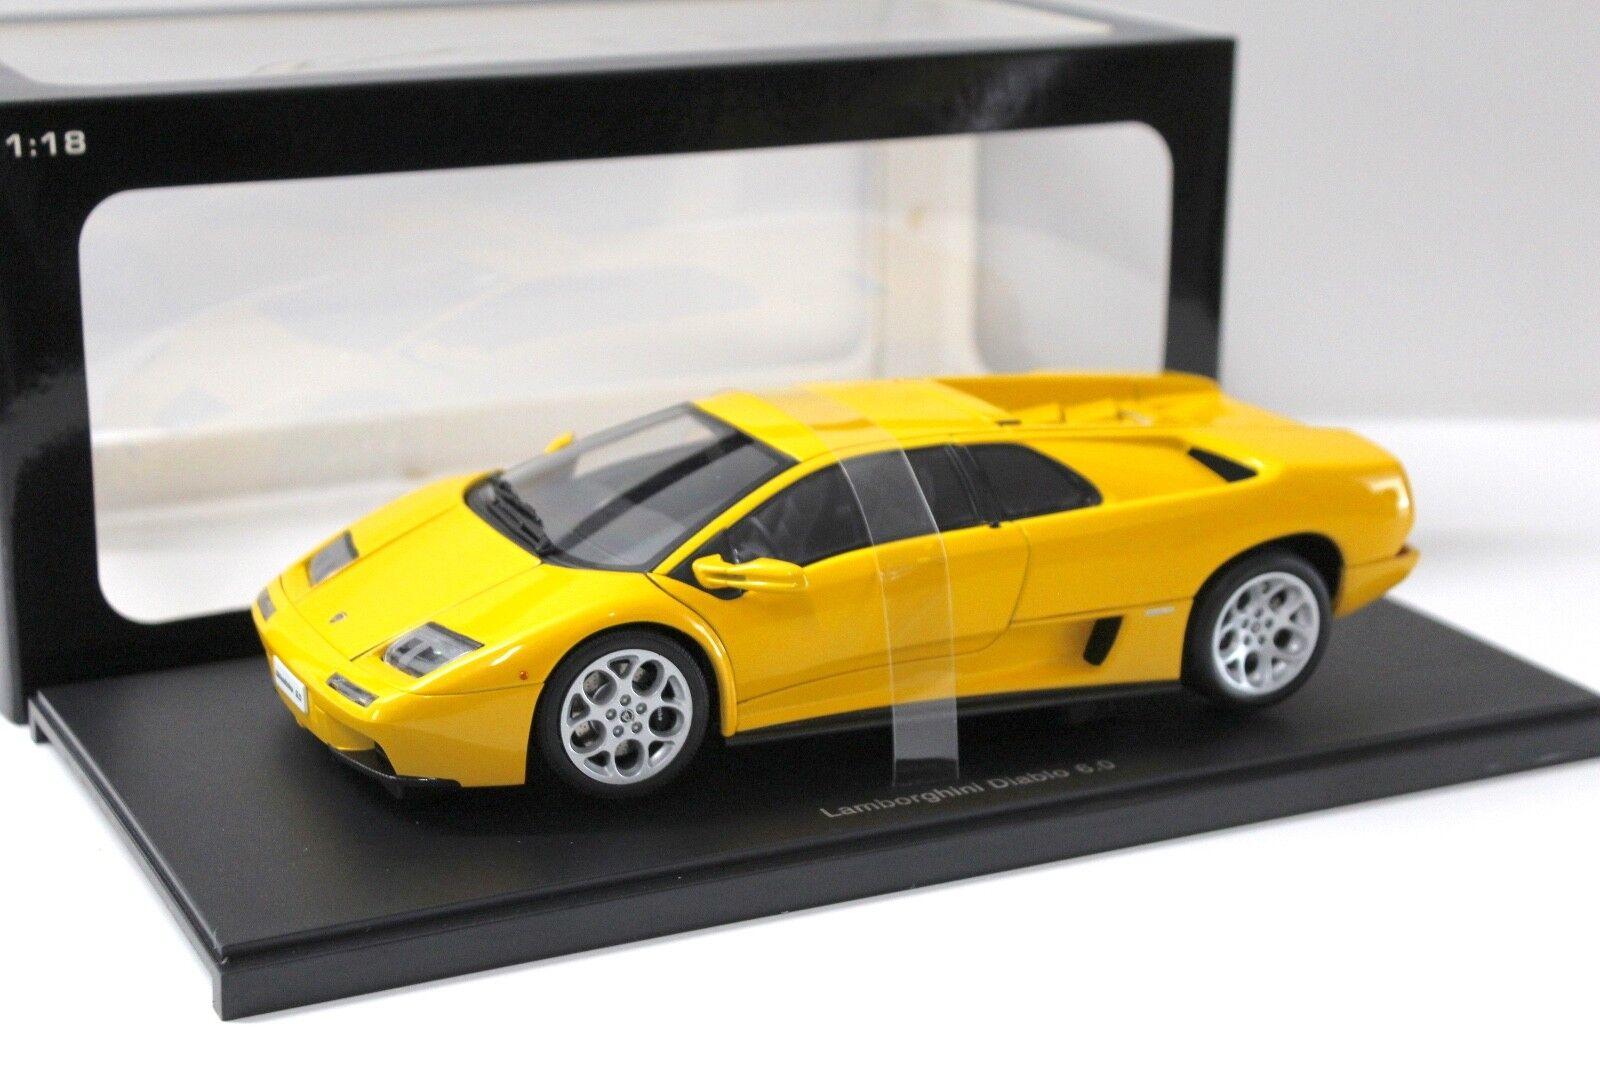 grandes ahorros 1 18 Autoart Lamborghini Diablo 6.0 6.0 6.0 amarillo New en Premium-modelCoches  seguro de calidad